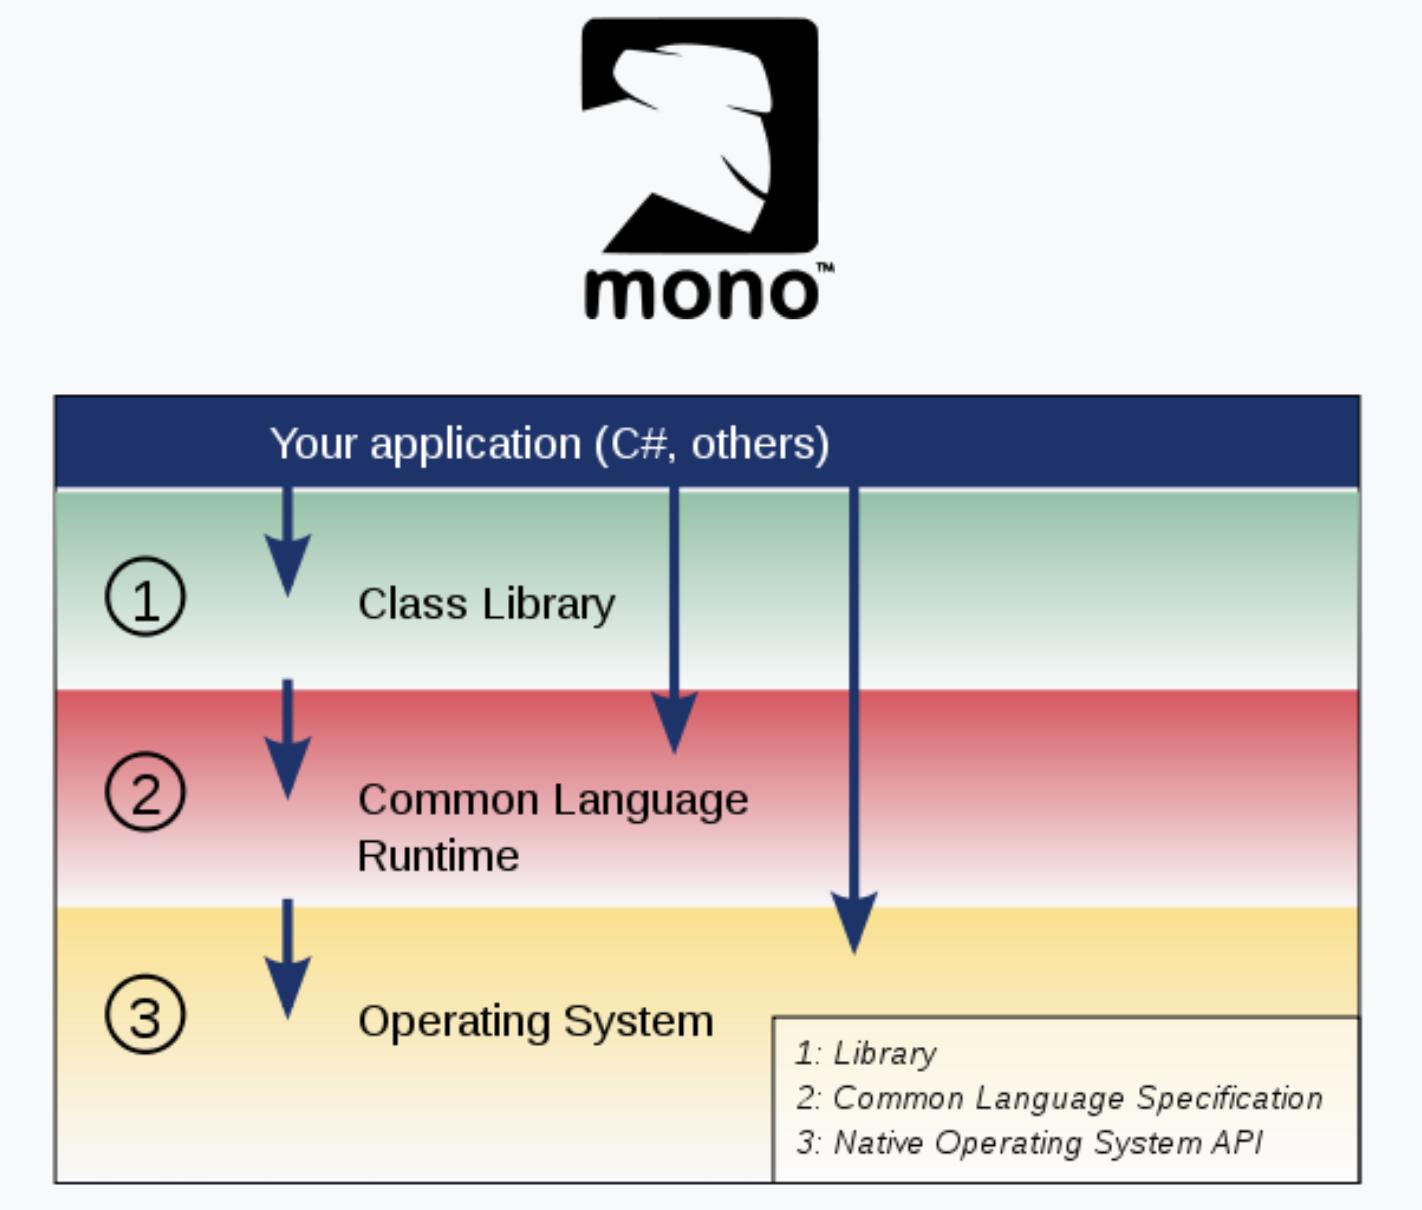 Мигель де Икаса: от Midnight Commander до Mono в .NET 5 - 5